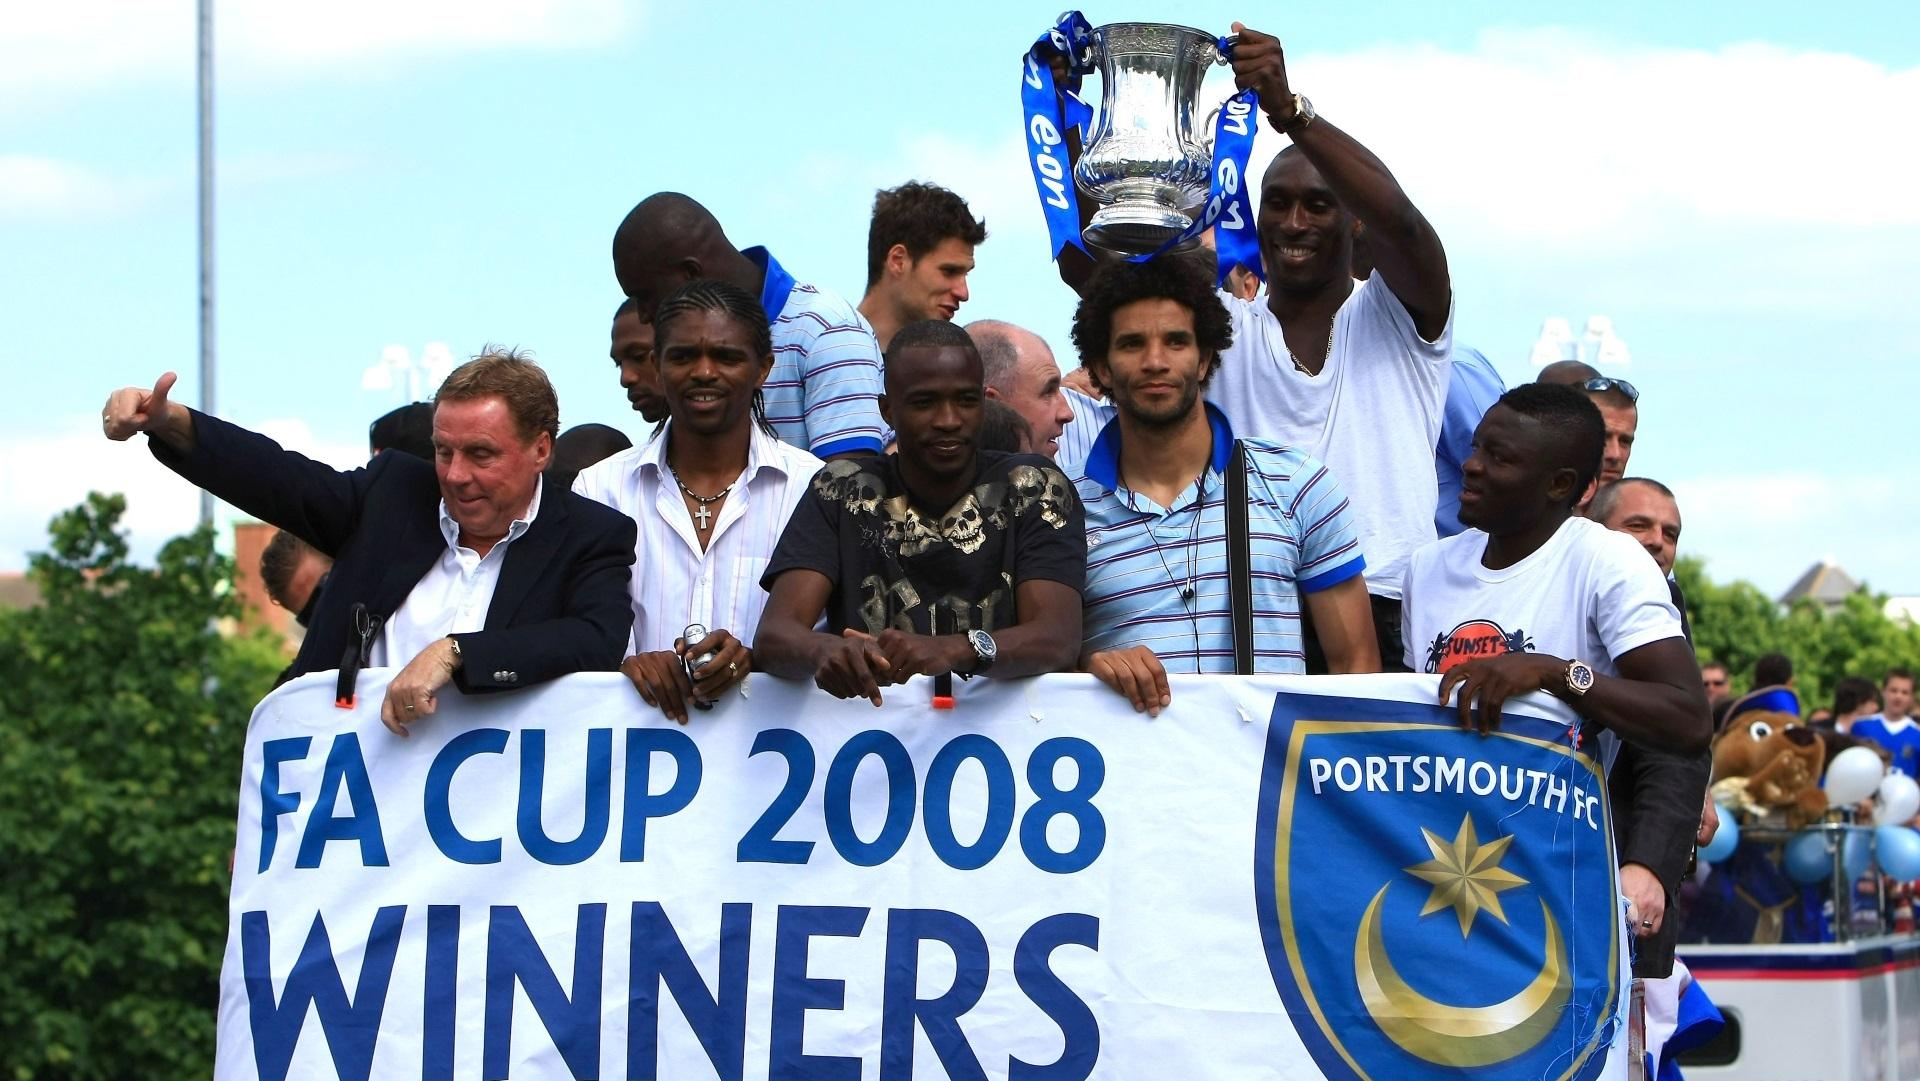 Harry Redknapp, Nwankwo Kanu, John Utaka, David James, Sol Campbell and Sulley Muntari of Portsmouth